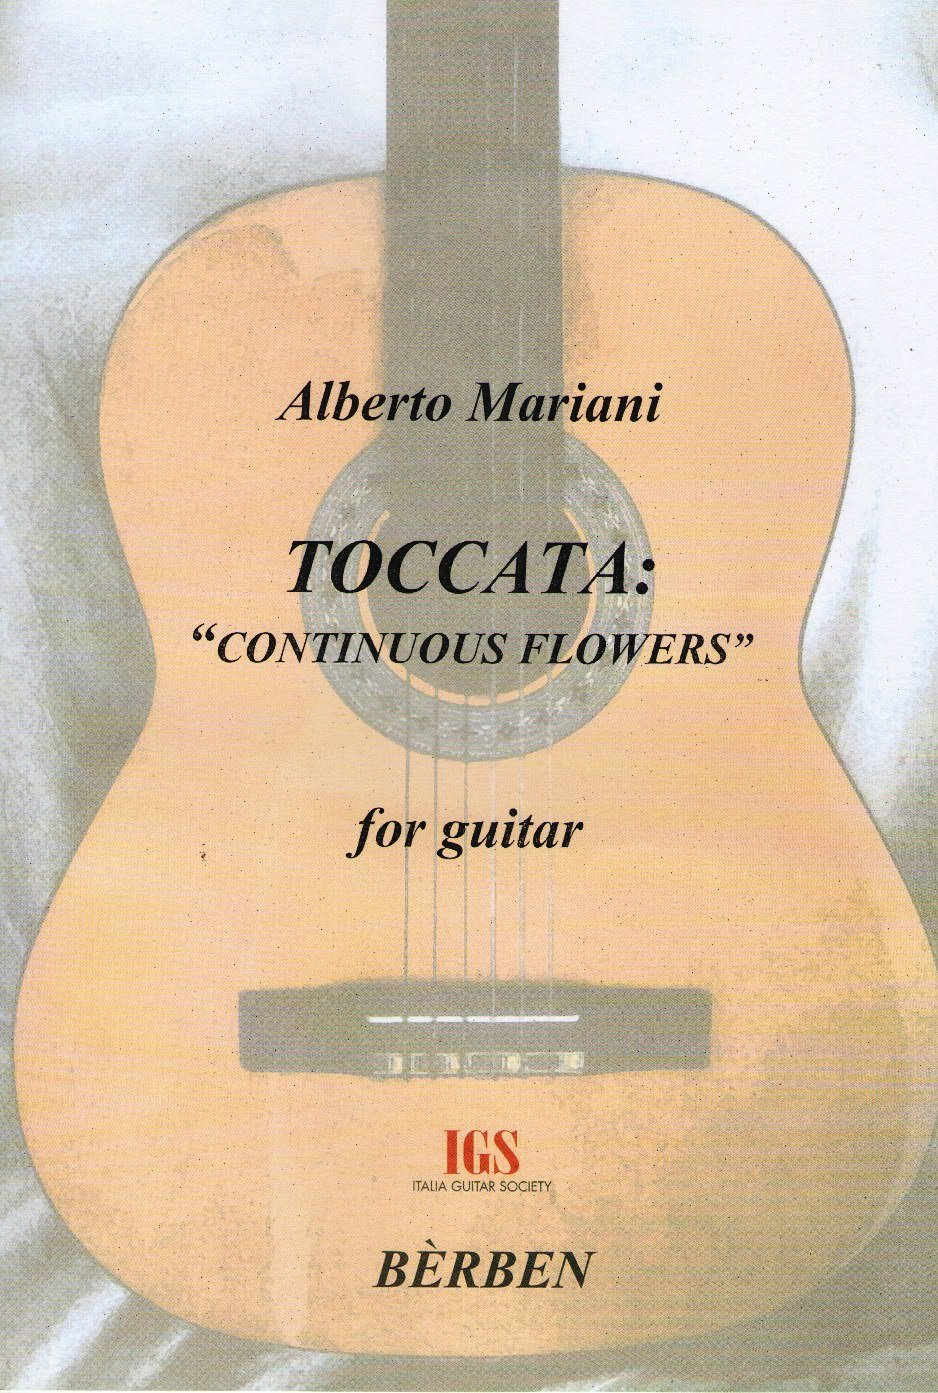 Alberto Mariani, Toccata: Continuous Flowers